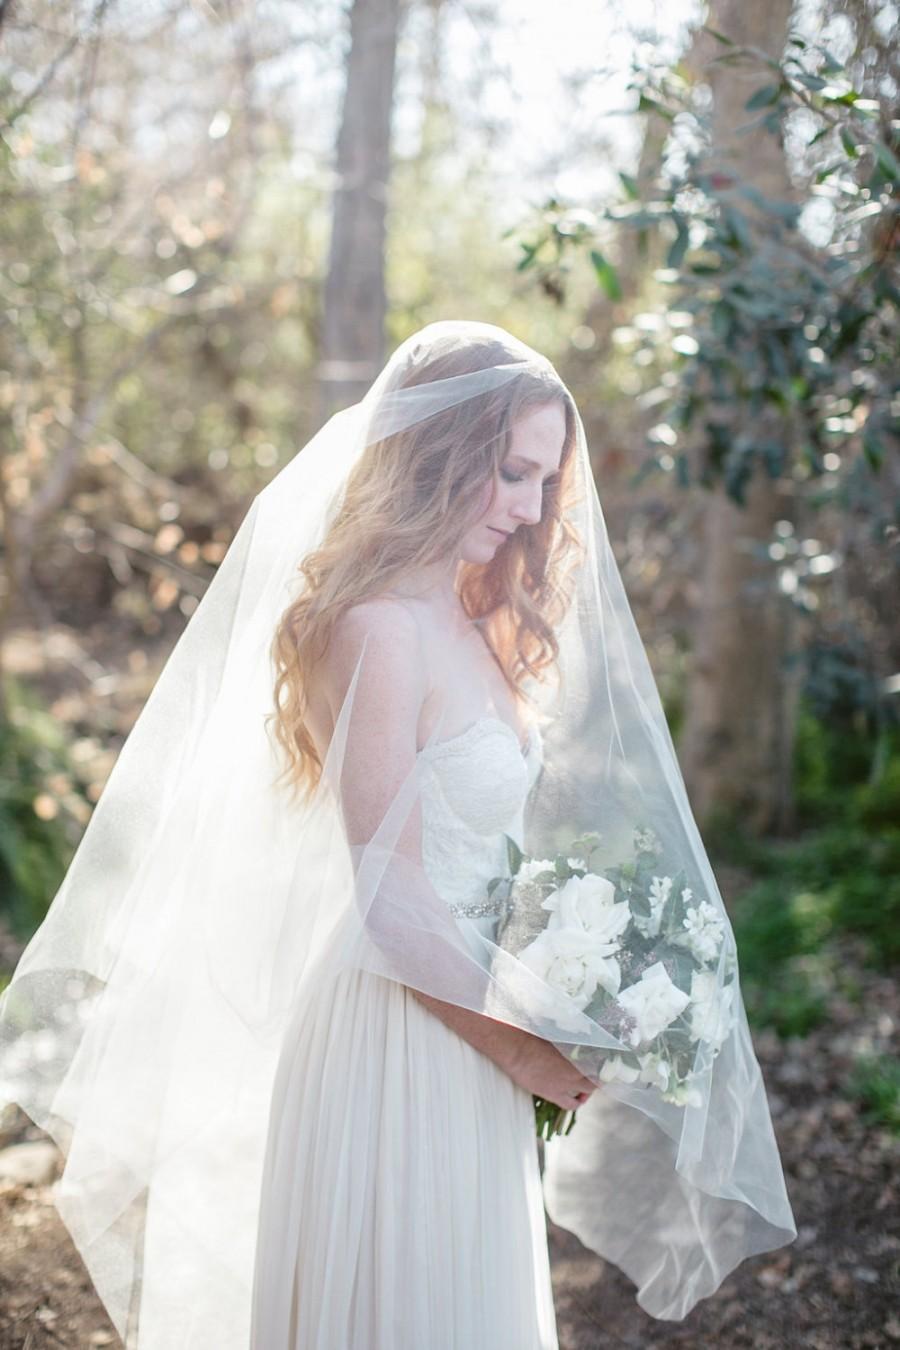 Hochzeit - Cathedral Bridal Veil, Simple Veil, Drop Veil, Circle Veil, Bridal Veil, Long Veil, Double Veil, Tulle Veil, Silk Tulle Veil, Lucille Veil